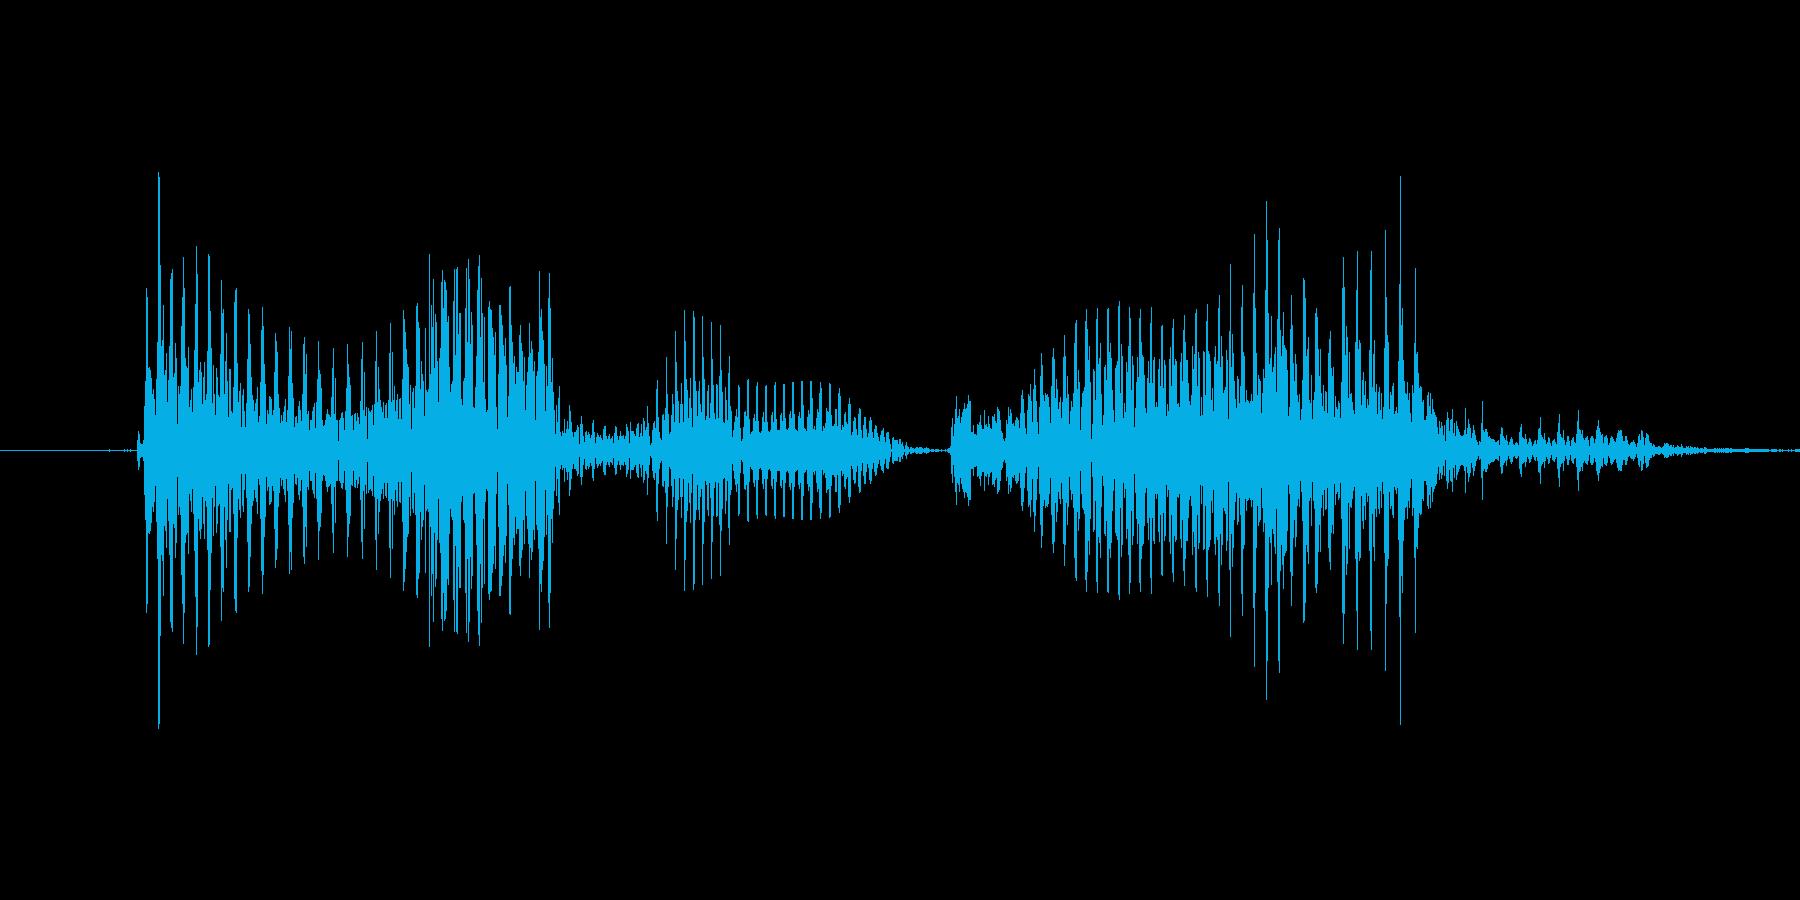 「11 PM」英語発音の再生済みの波形